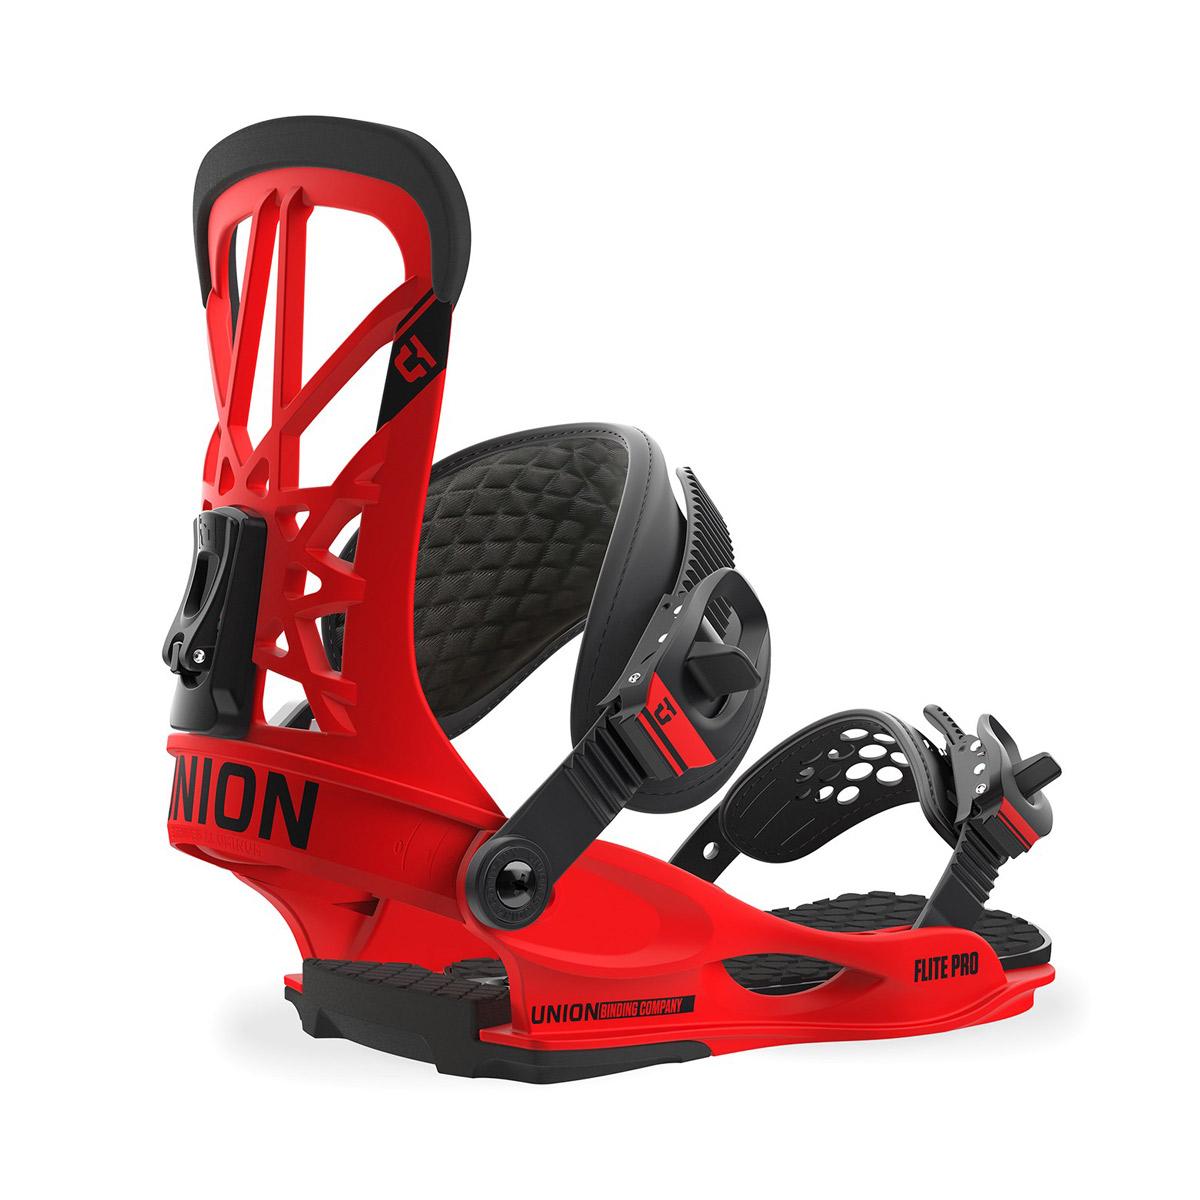 Крепления для сноуборда UNION Flite Pro Red 2018